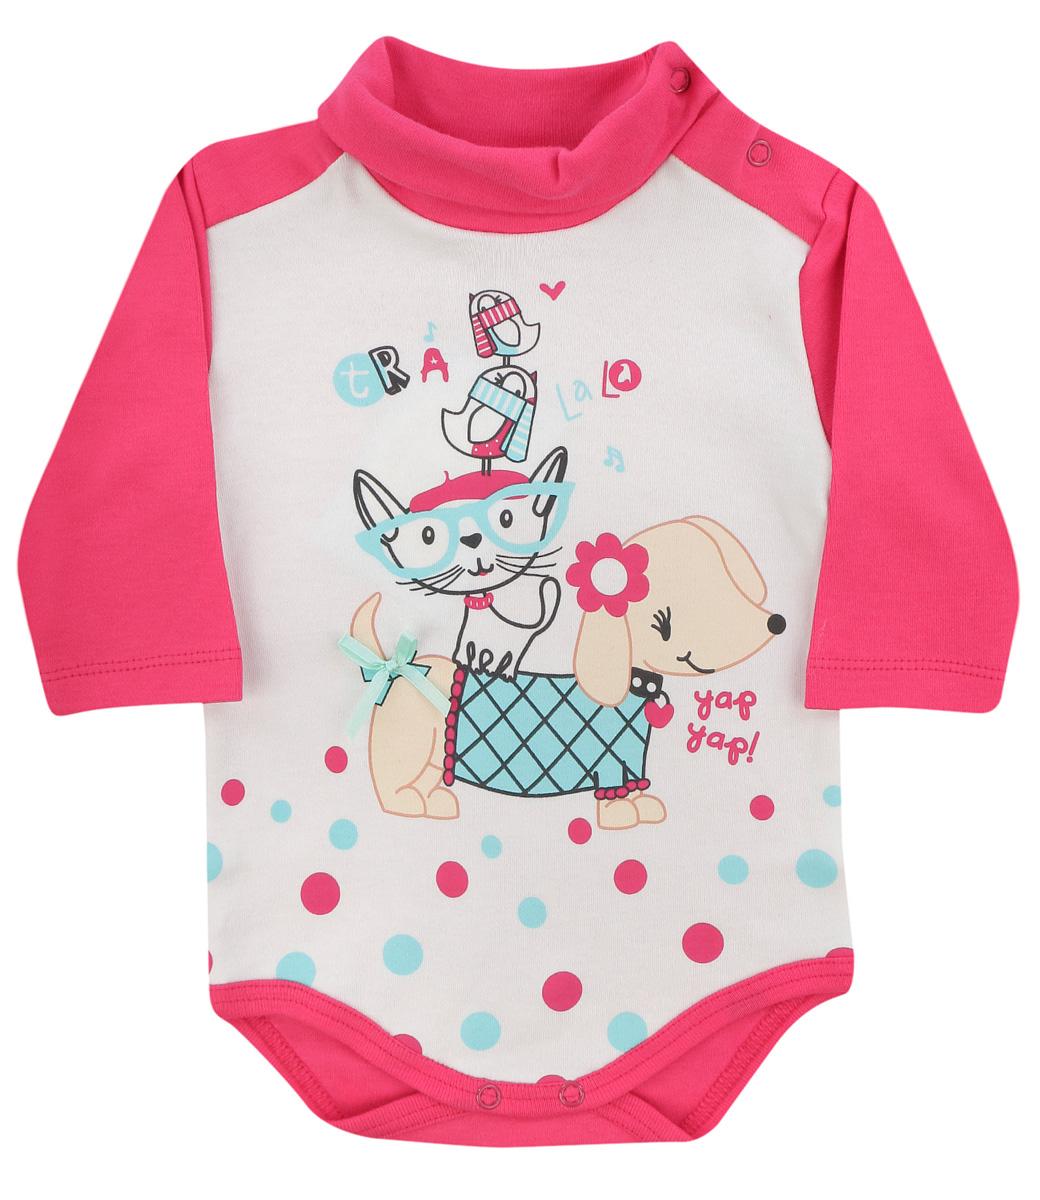 Боди для девочек Soni Kids Прогулка с Мими, цвет: розовый, белый. З7101011. Размер 80 soni kids кофточка